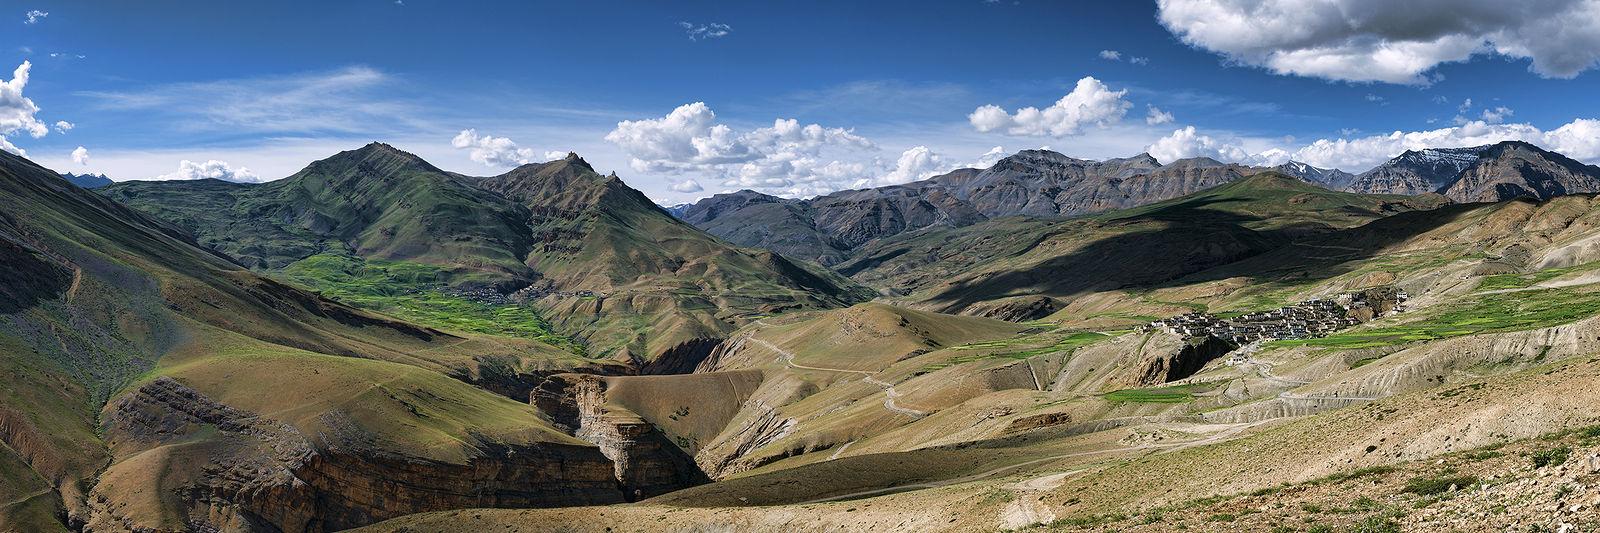 Ivan Aleshin. NH21 and other Himalayan Roads. 0008